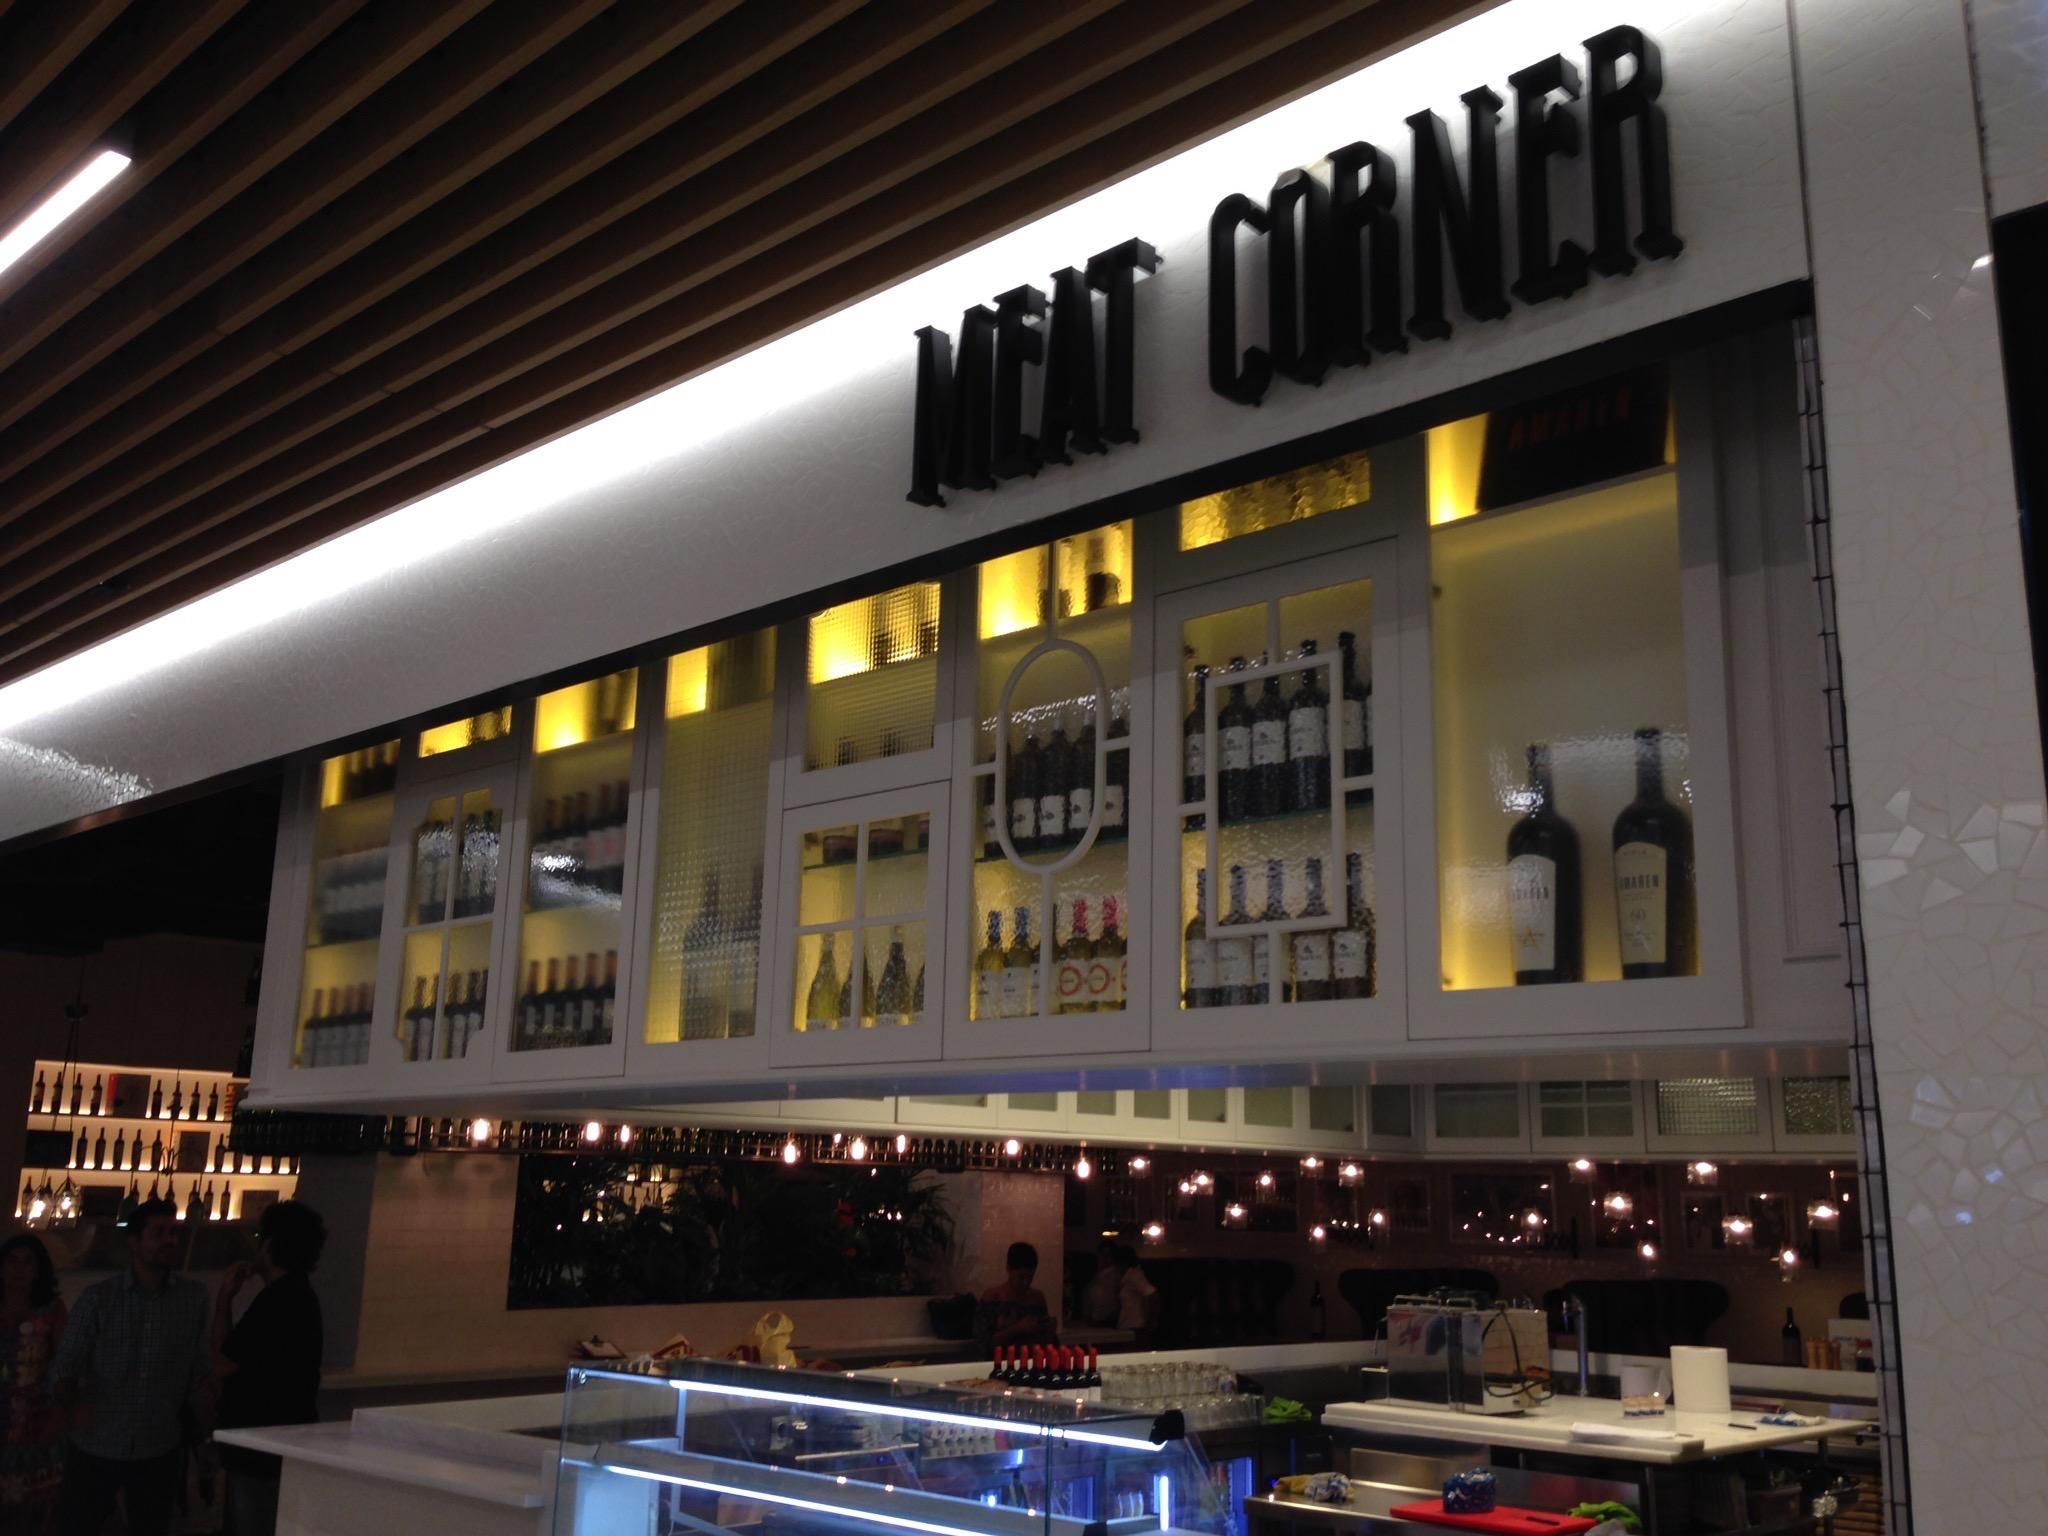 Meat Corner